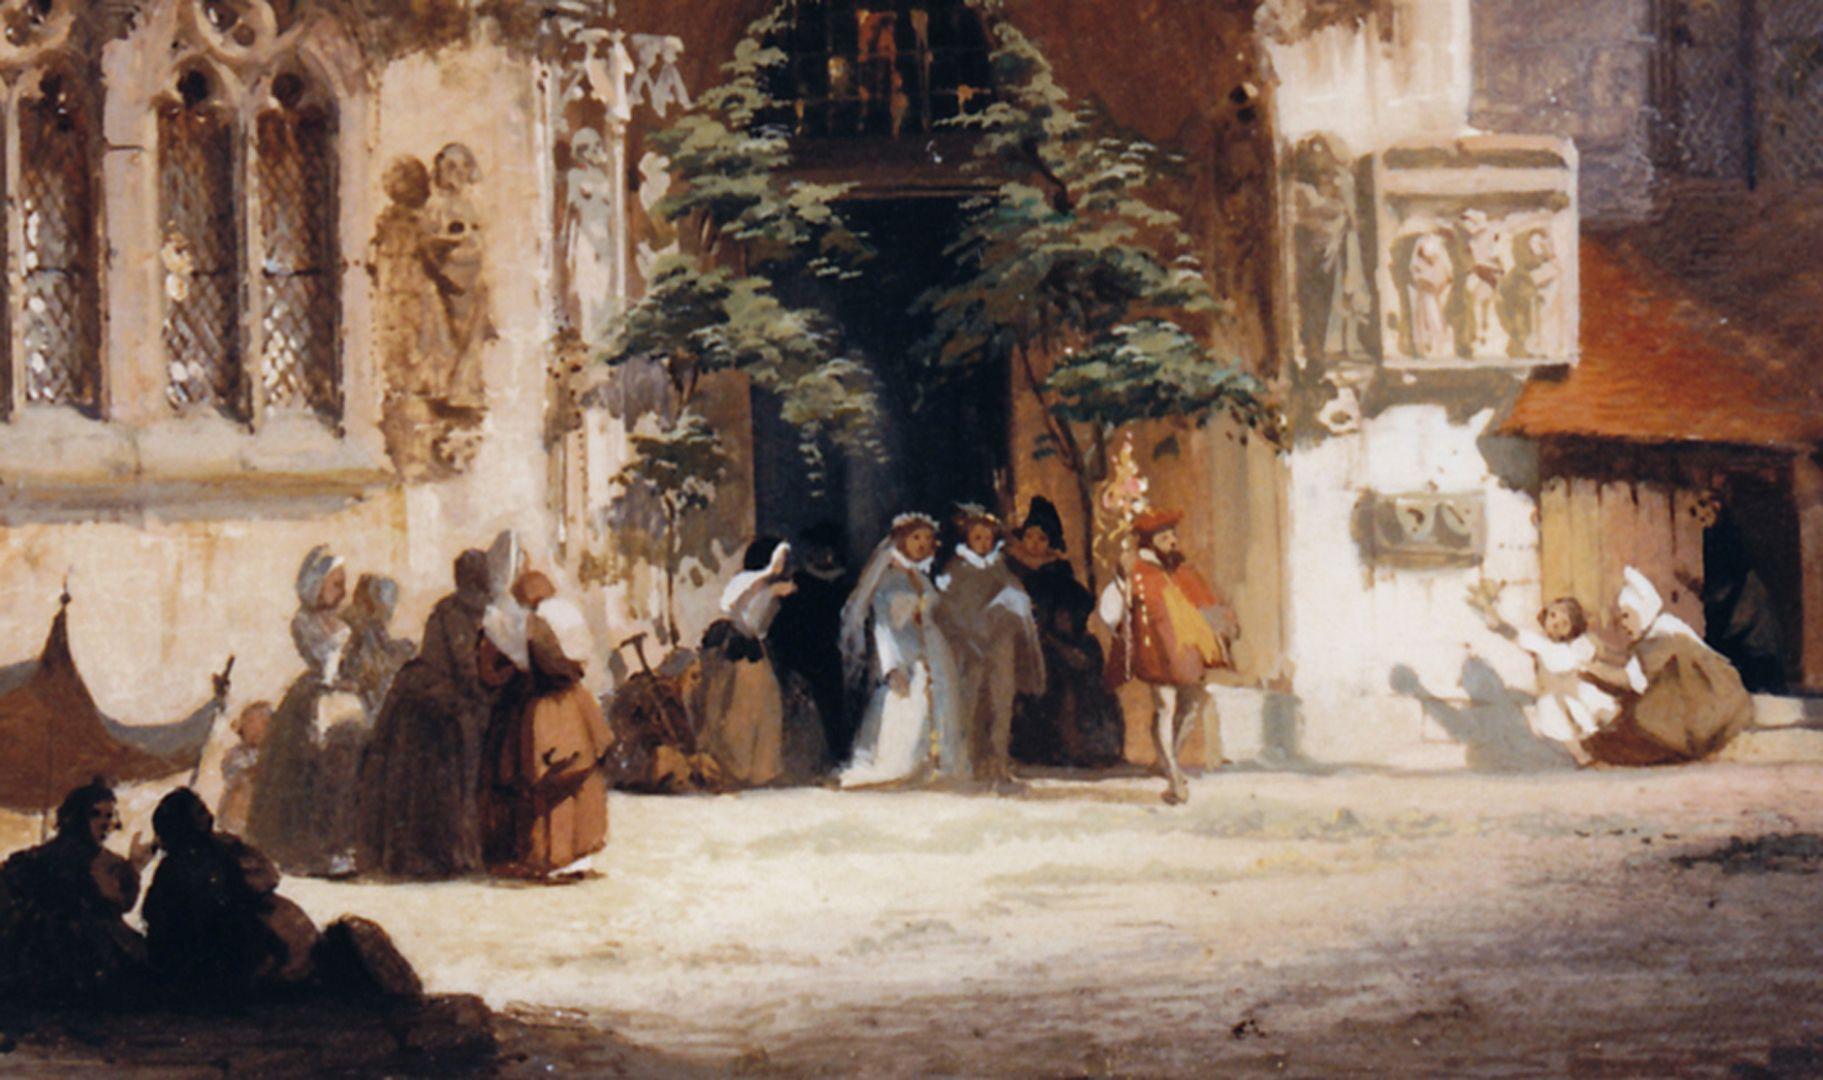 Bridal portal at the Sebaldus Church Detail with wedding party